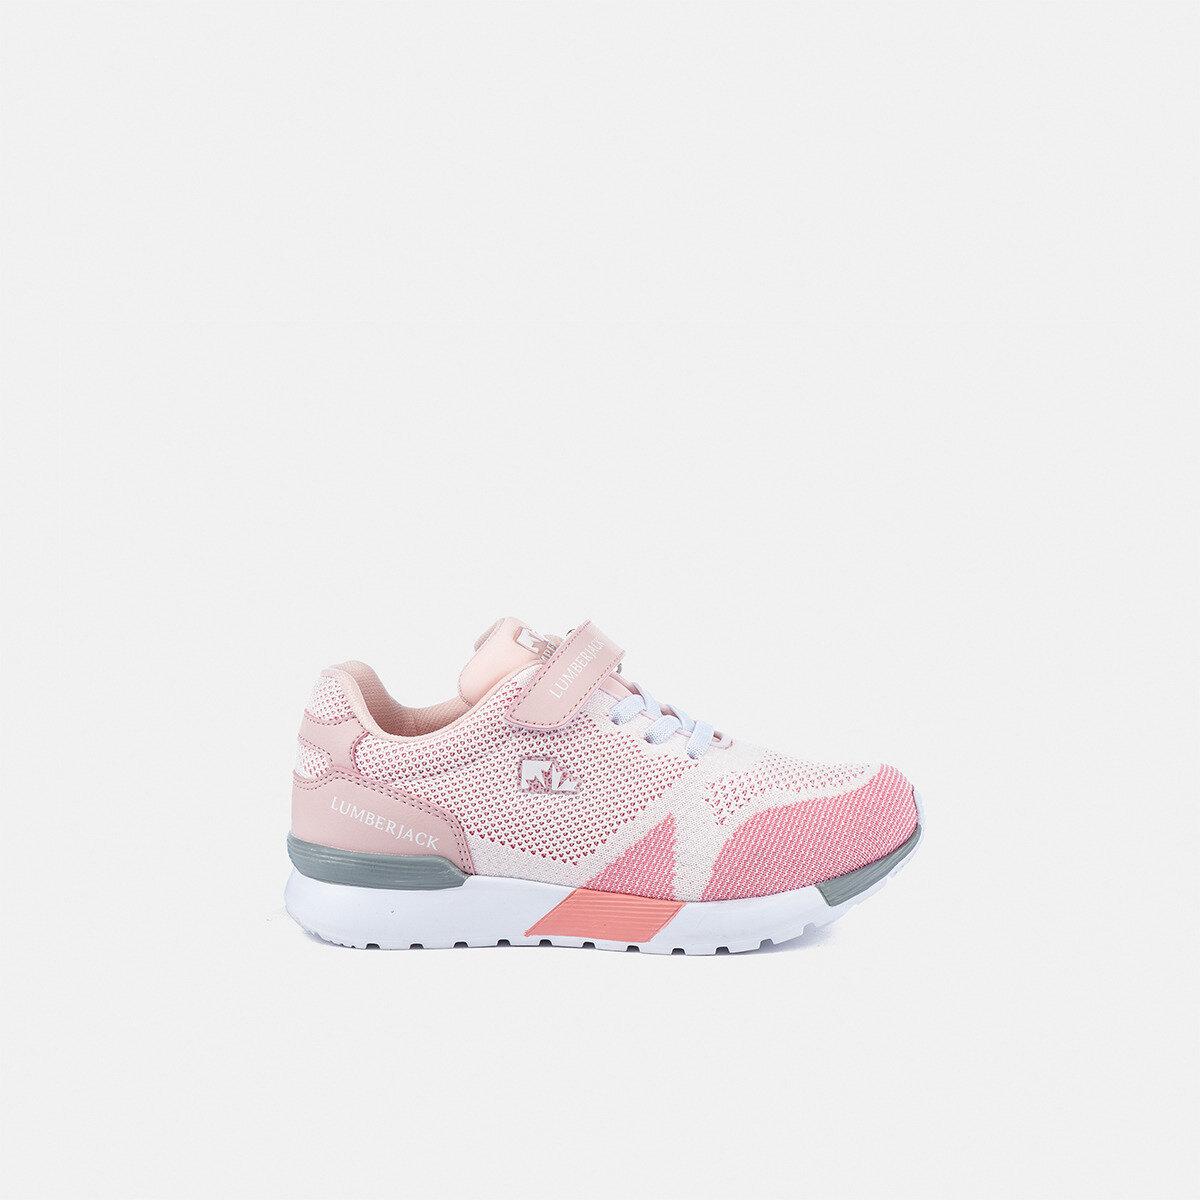 VENDOR PINK Girl Running shoes